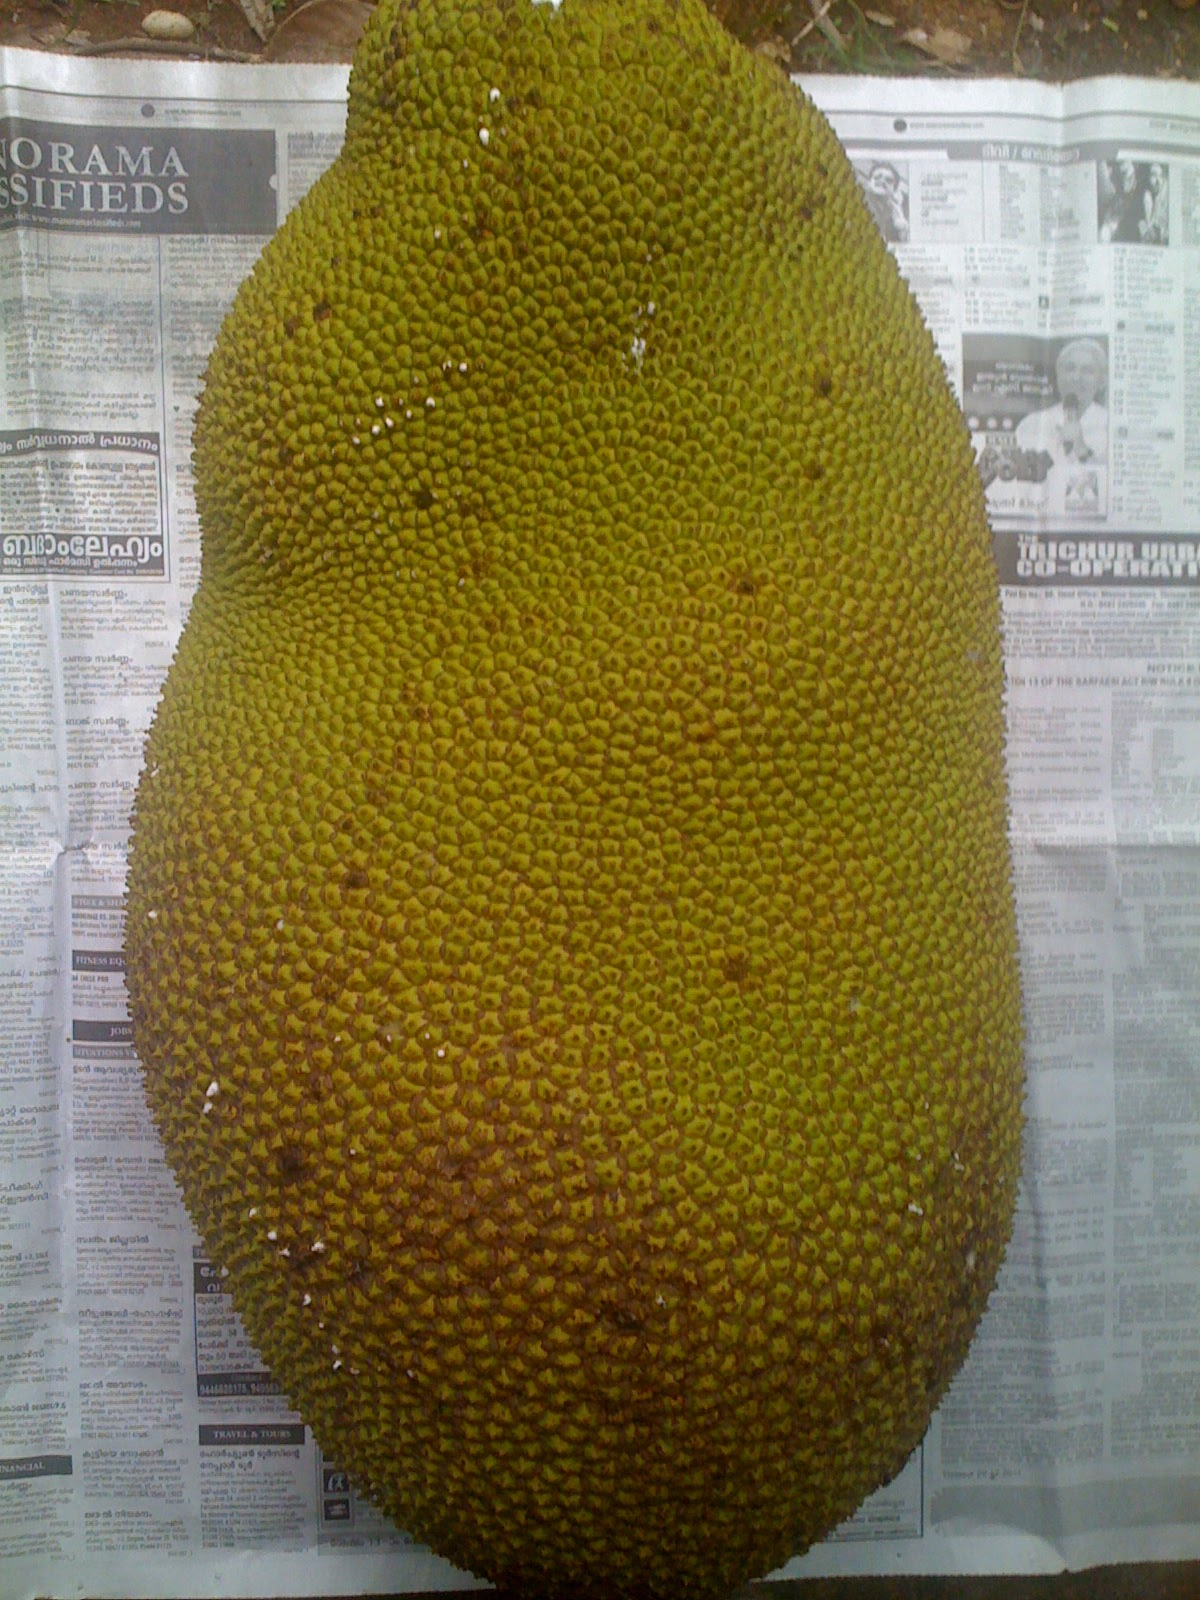 how to take care of jackfruit tree